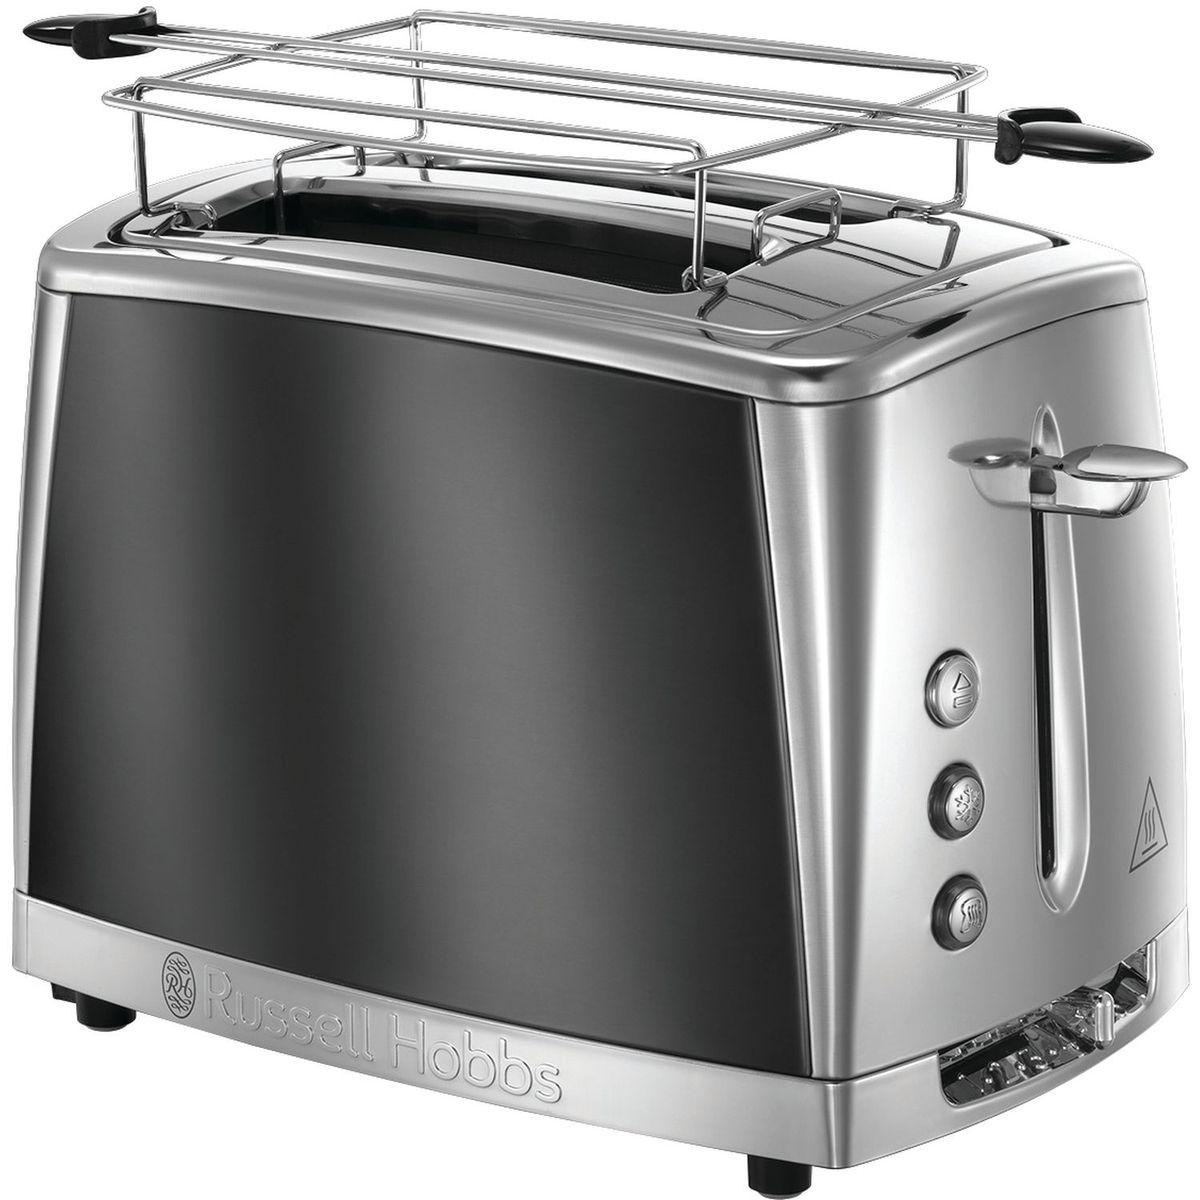 Toaster Luna 23221-56 - Gris clair de lune/inox